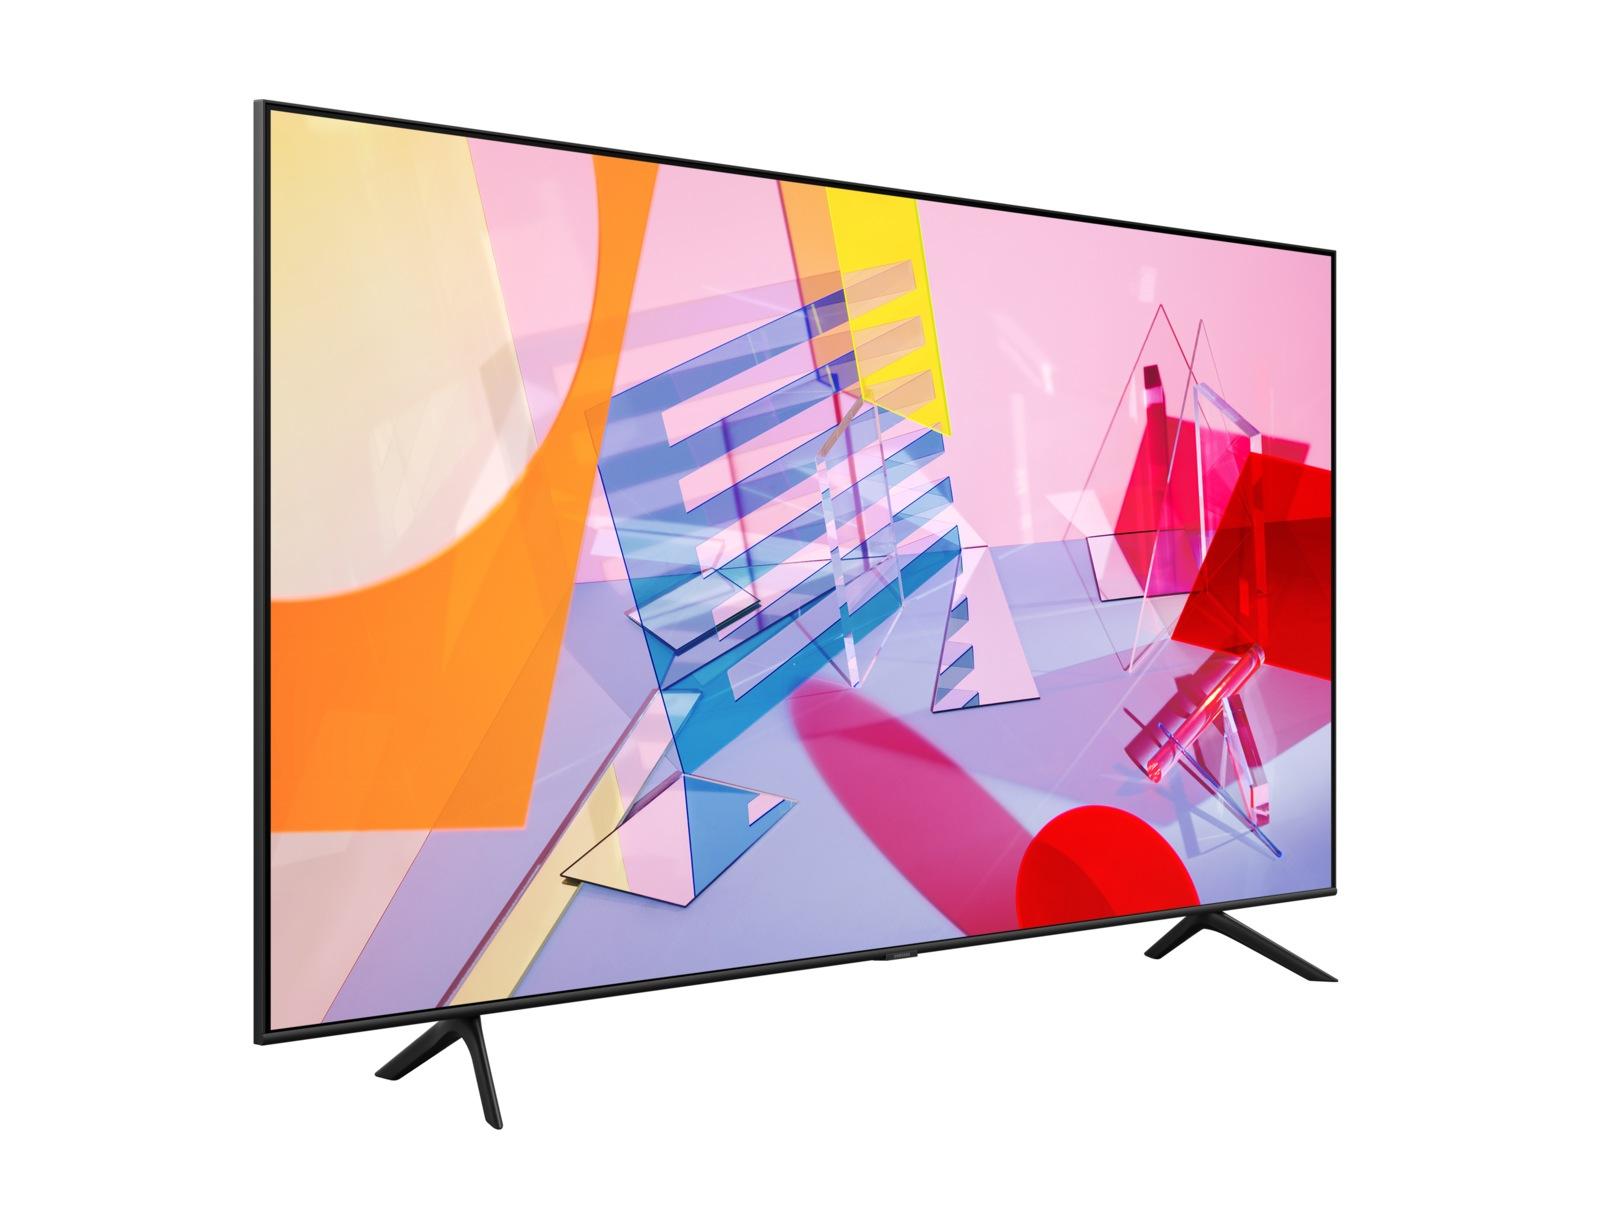 QLED TV 55 Samsung 55Q60TAU Smart TV, 4K